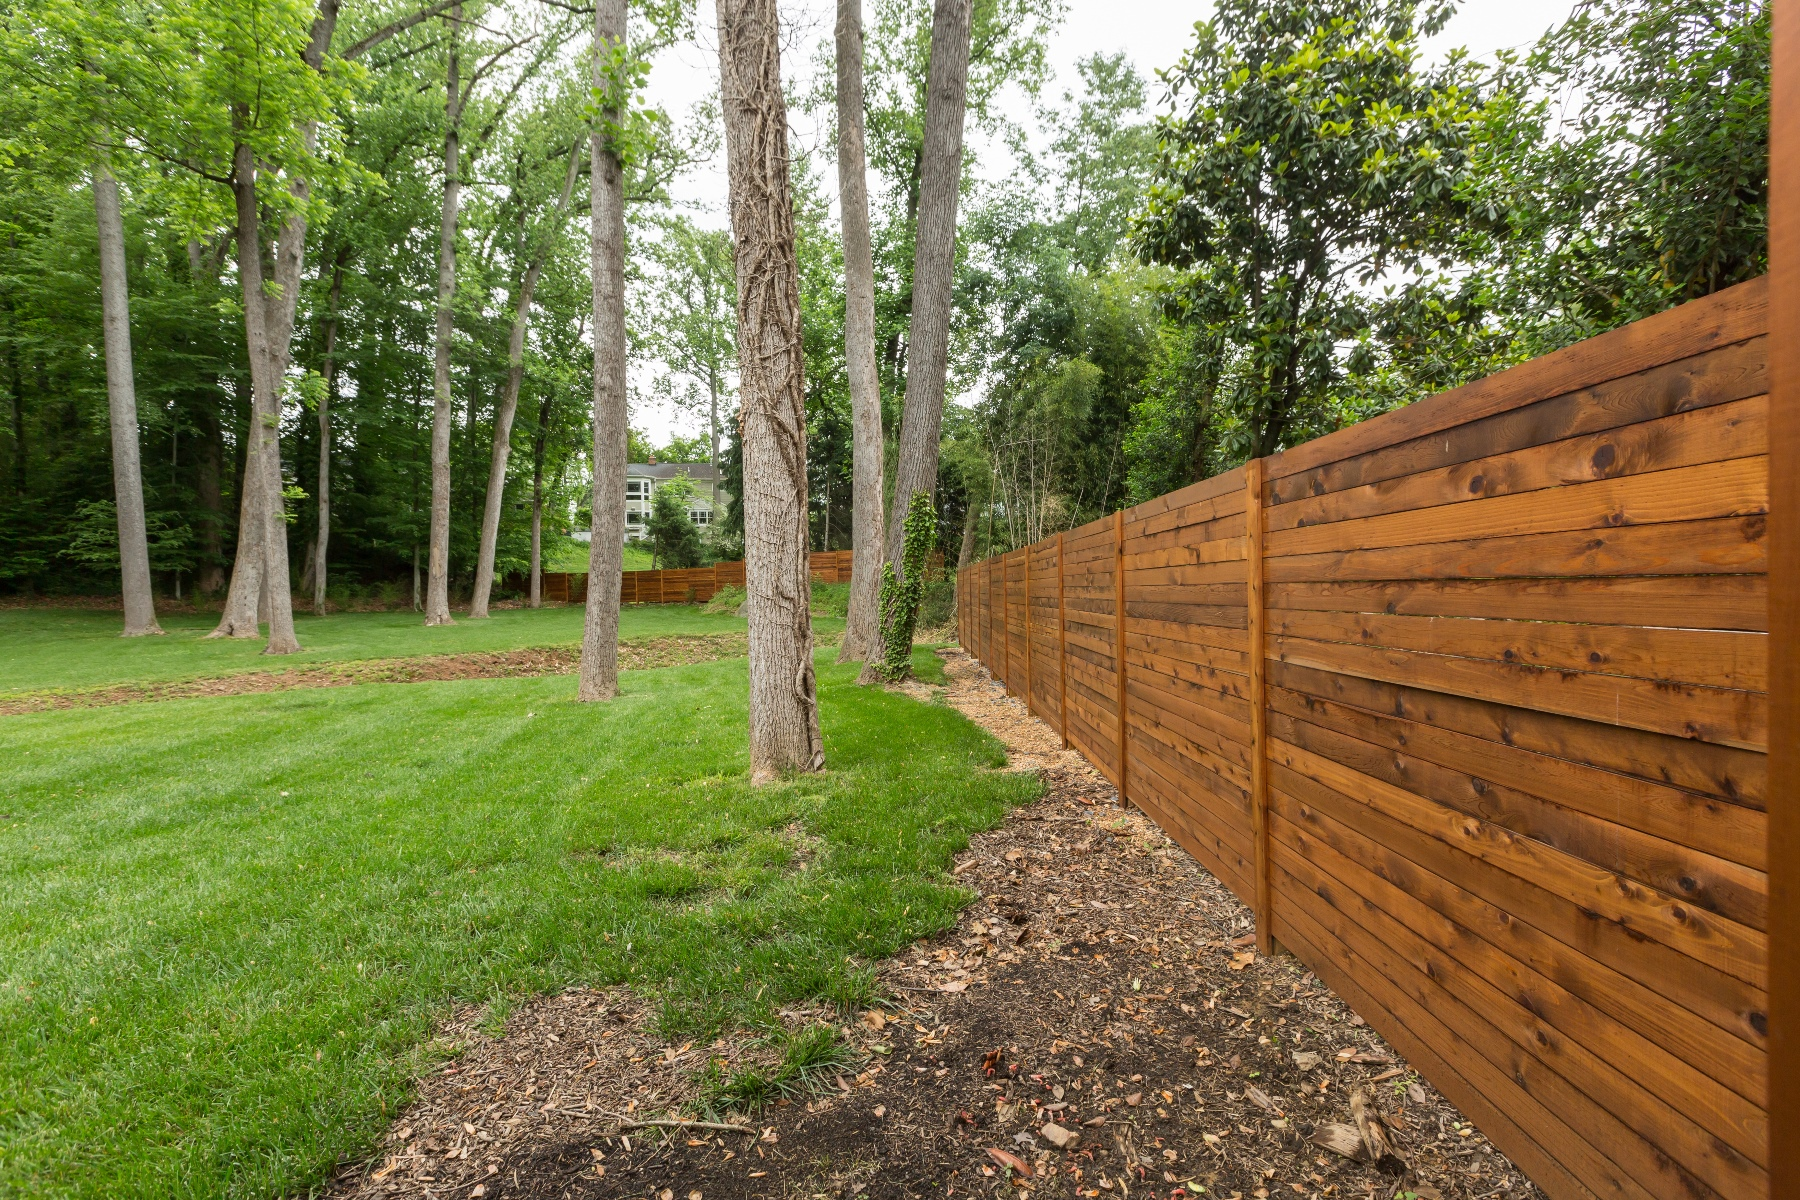 Additional photo for property listing at 6309 Bradley Boulevard, Bethesda 6309 Bradley Blvd Bethesda, メリーランド 20817 アメリカ合衆国